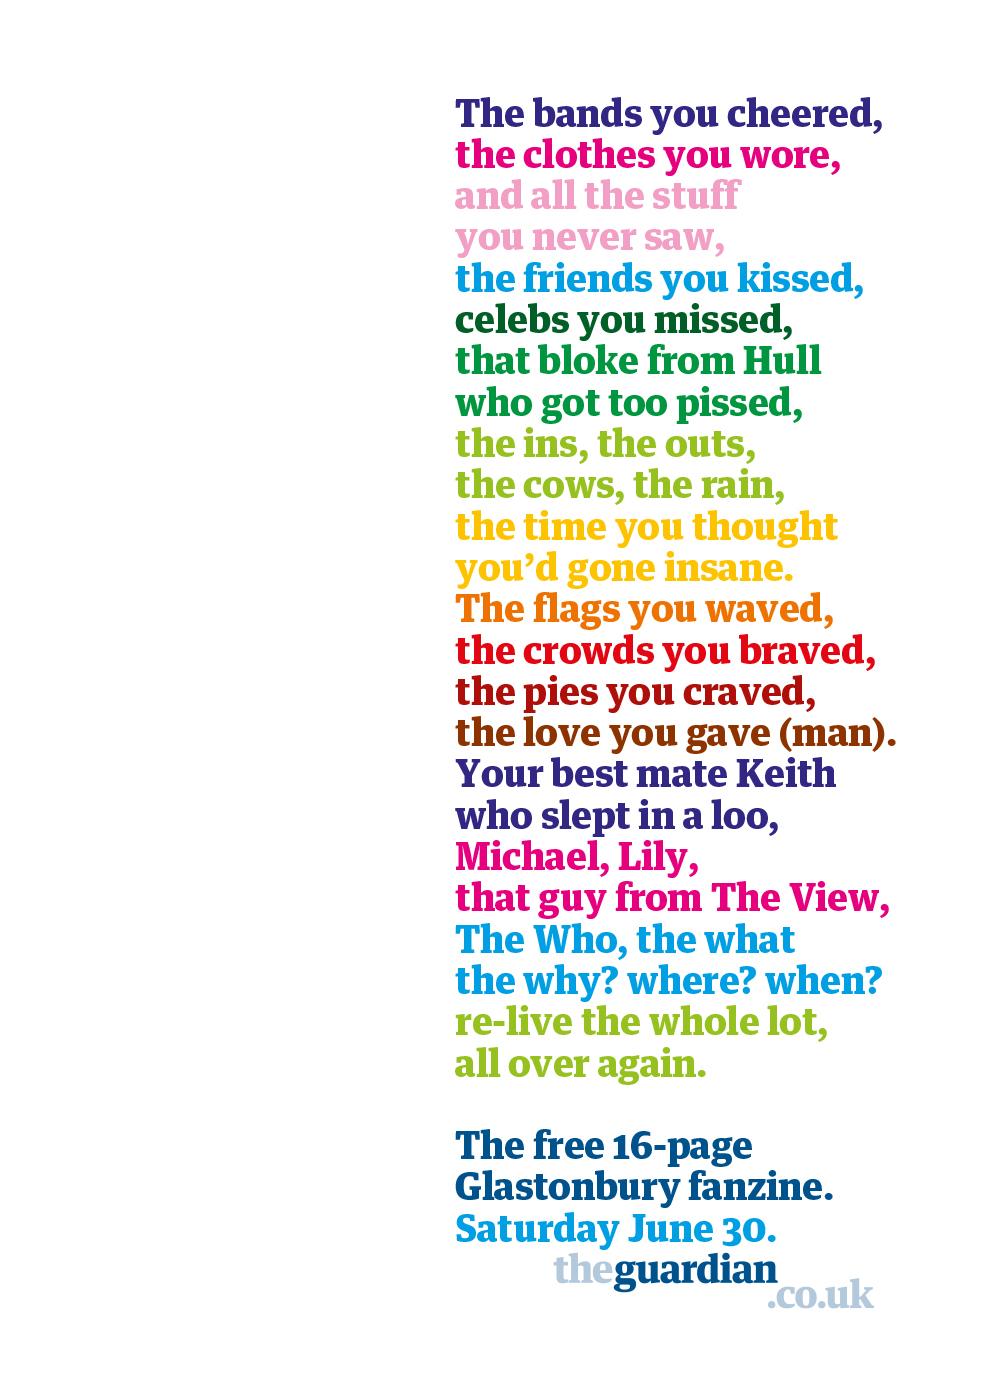 The Guardian Glastonbury Fanzine